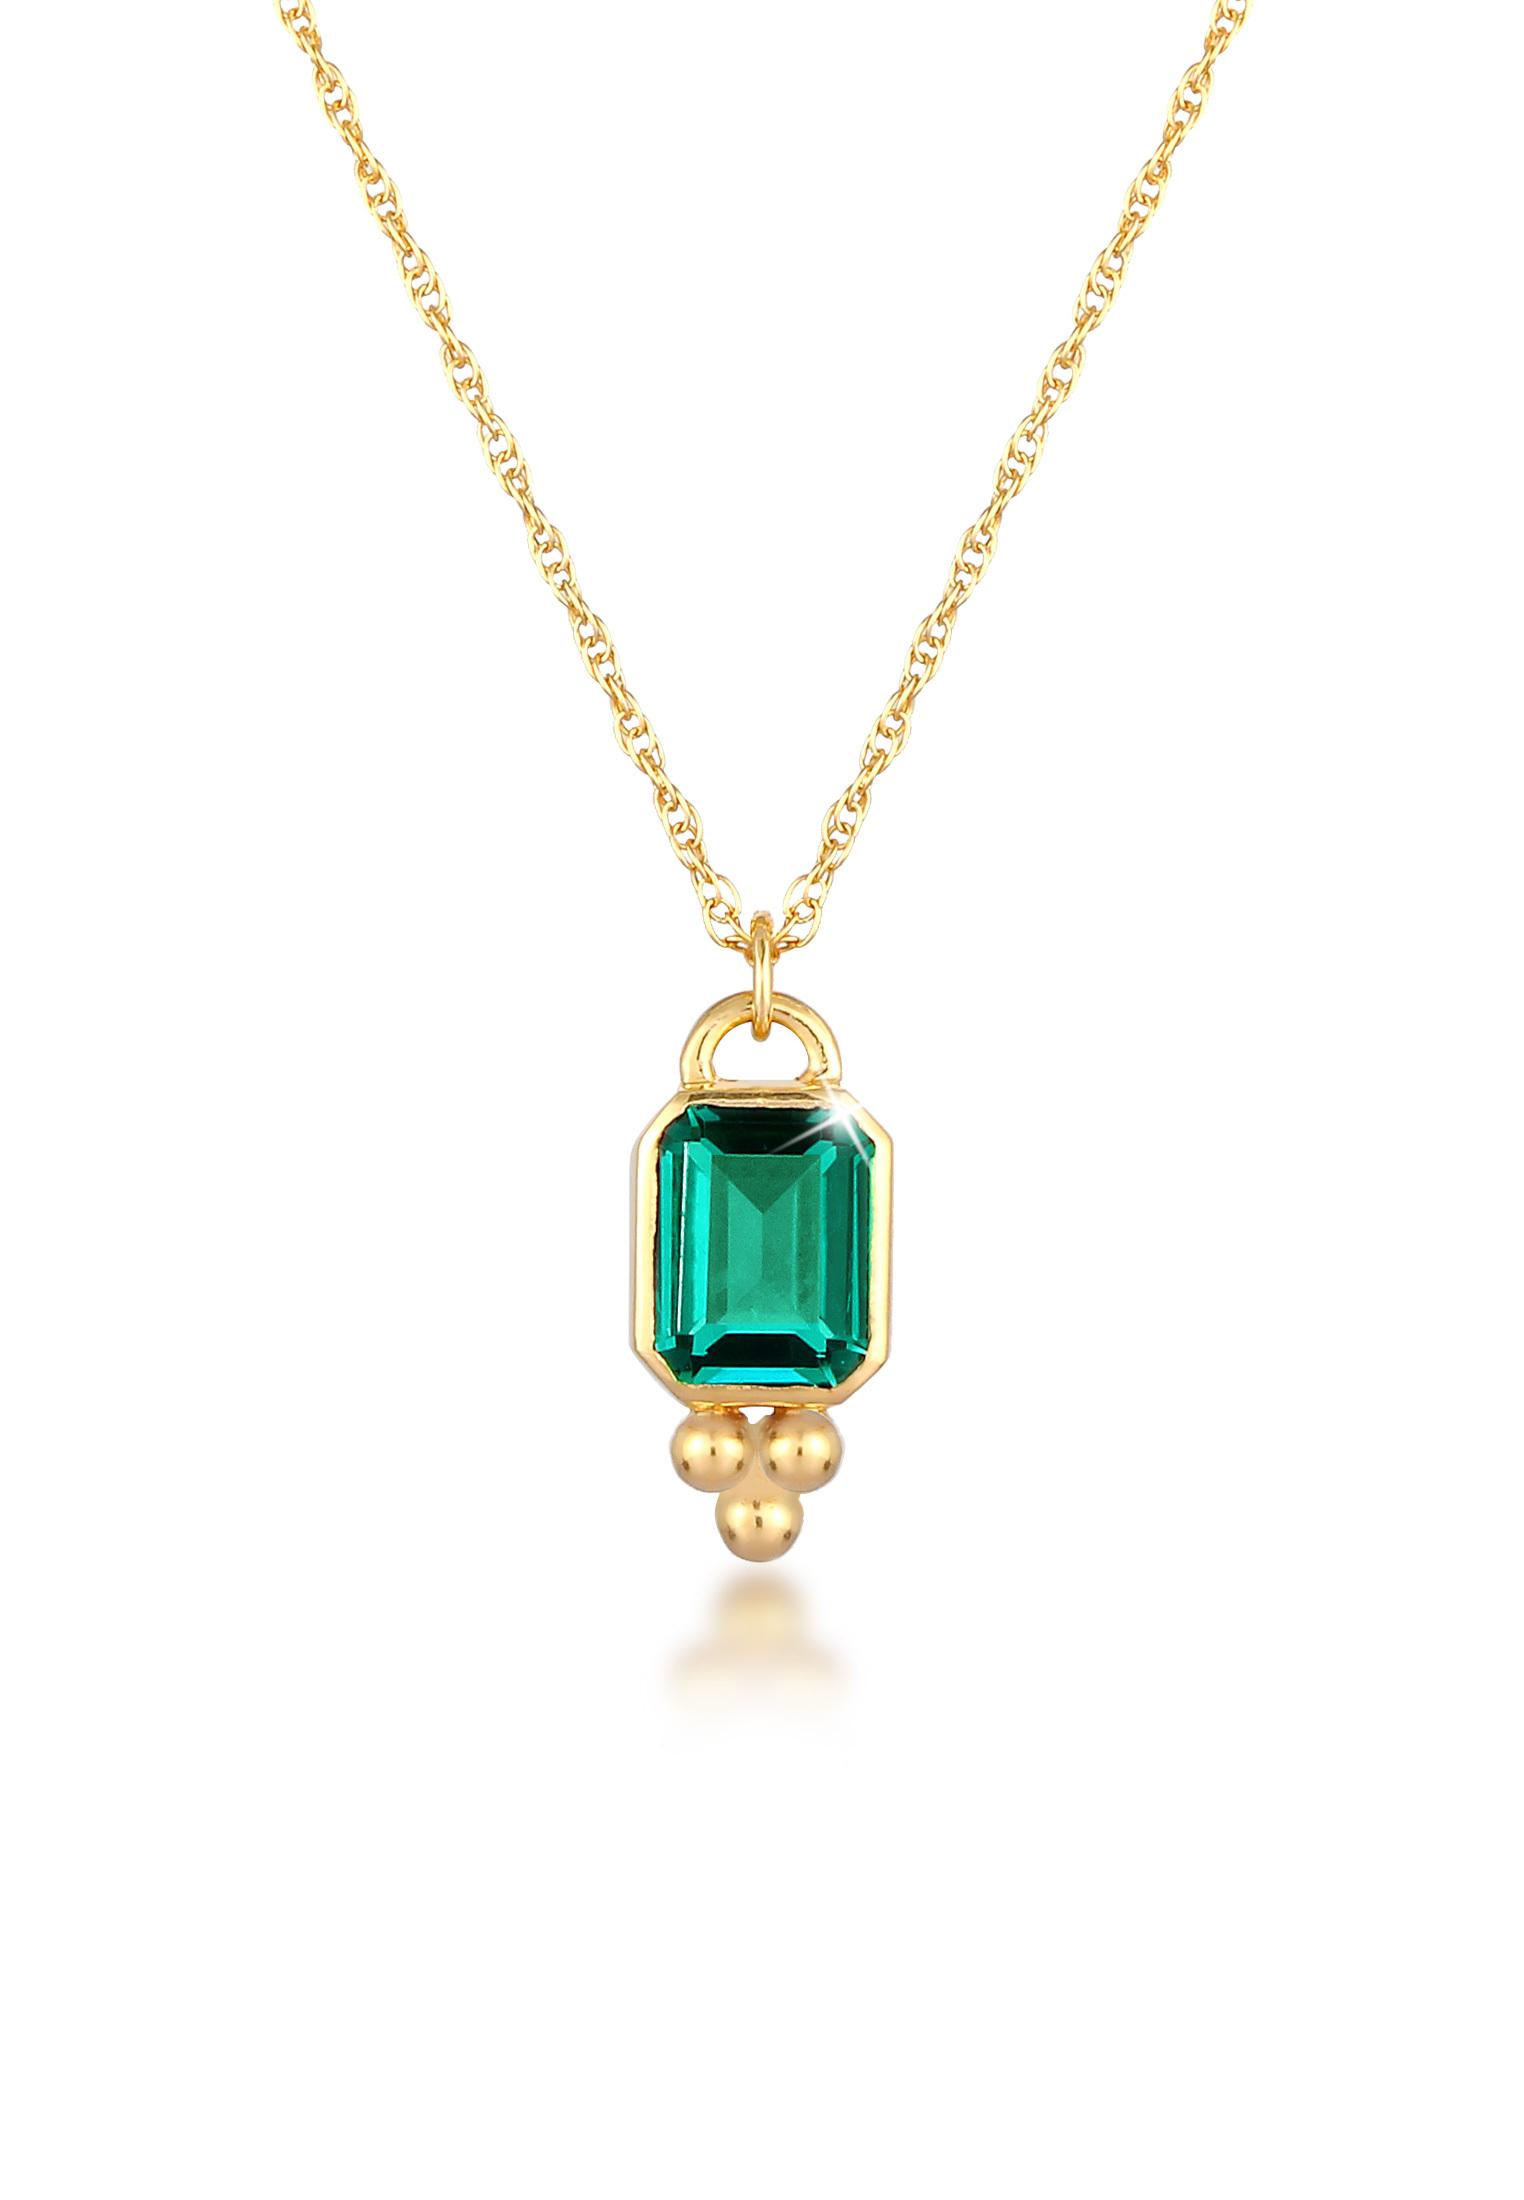 Halskette   Quarz ( Grün )   925 Sterling Silber vergoldet